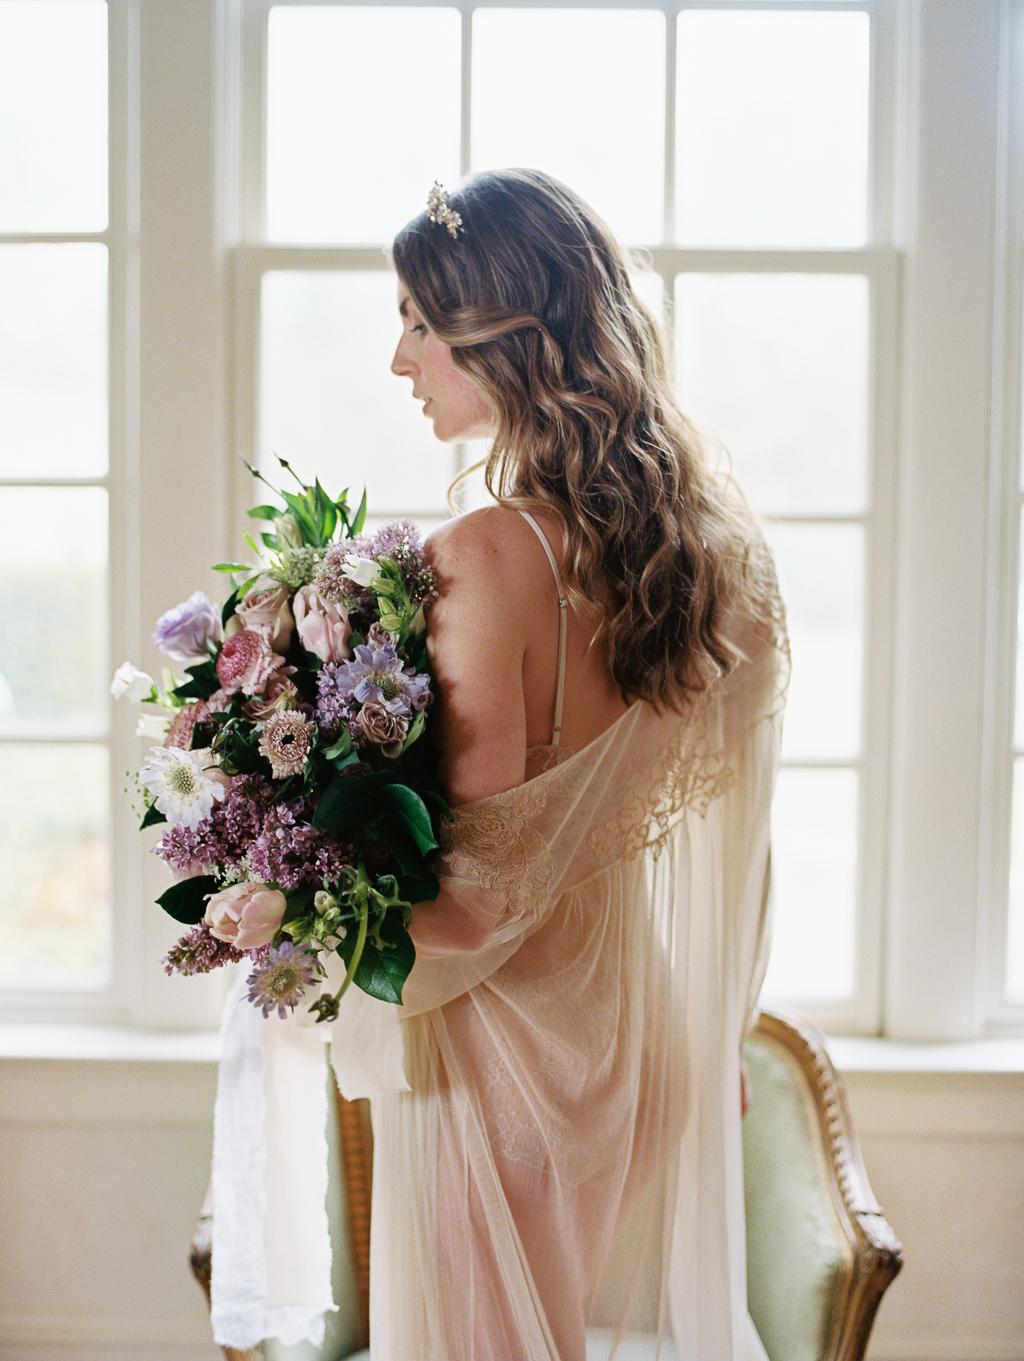 Adriana-m-events-washington-dc-wedding-planner